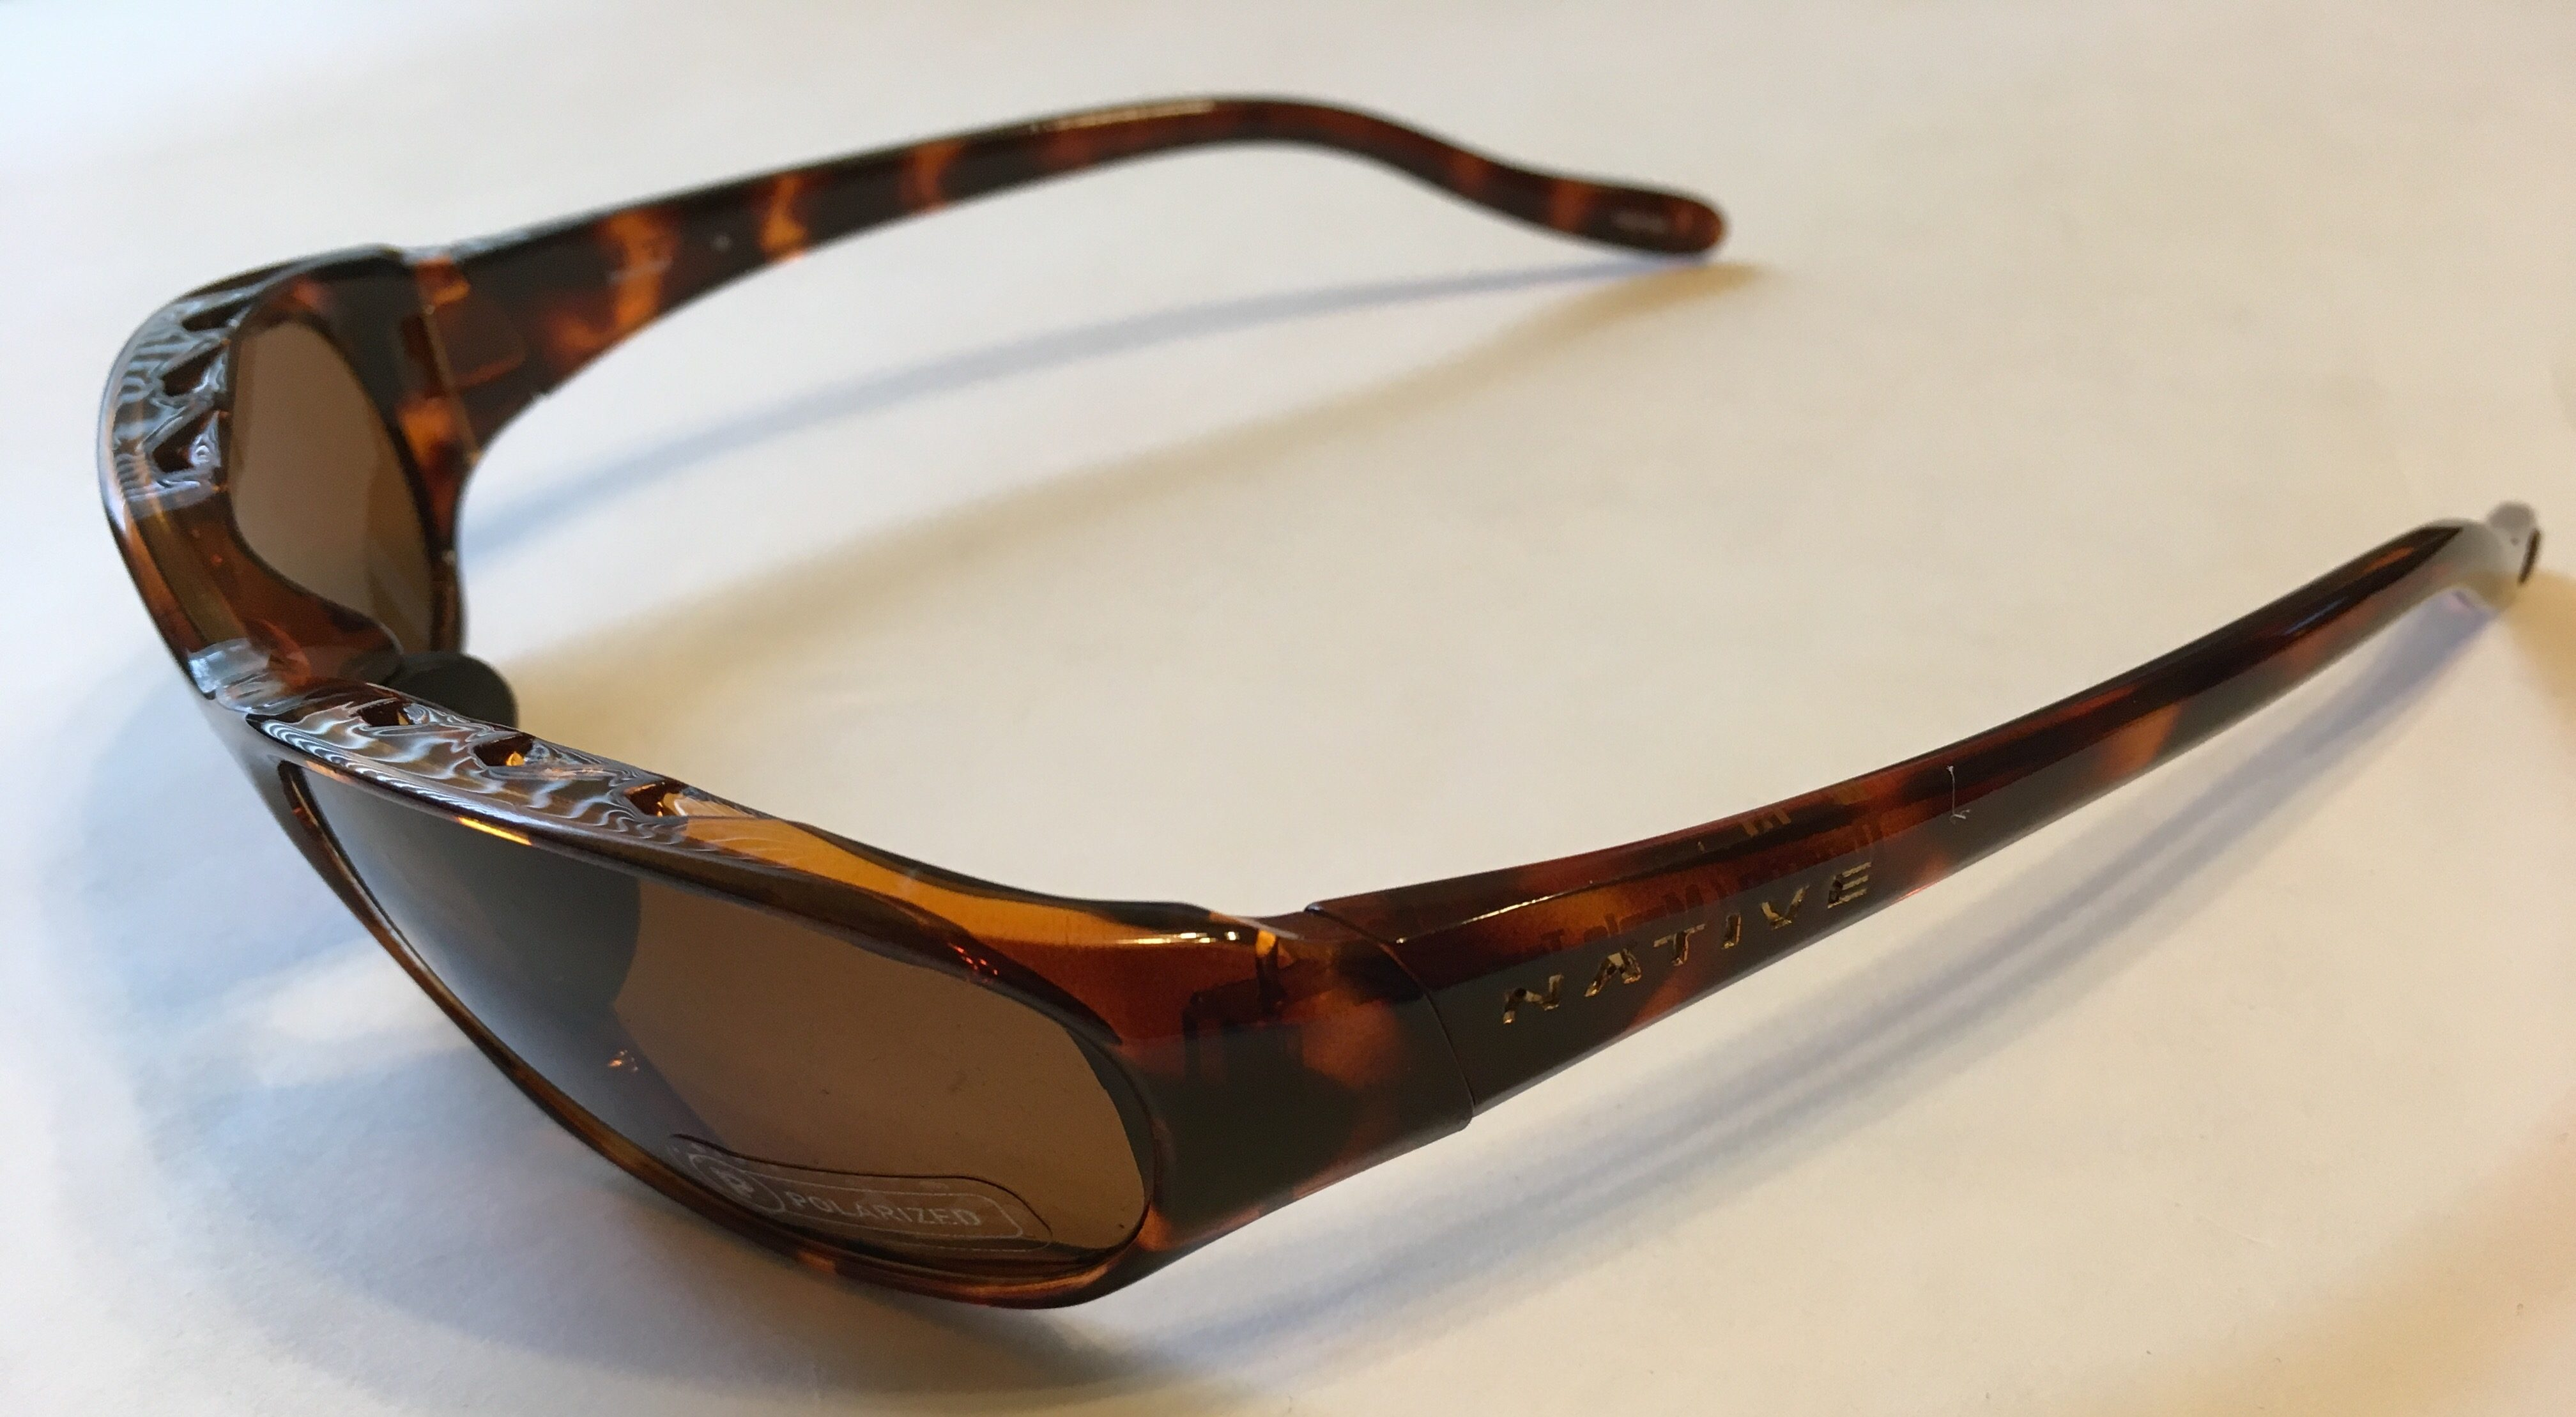 327fb00992 Native Eyewear Throttle Sunglasses - Maple Tortoise - POLARIZED Brown Lens